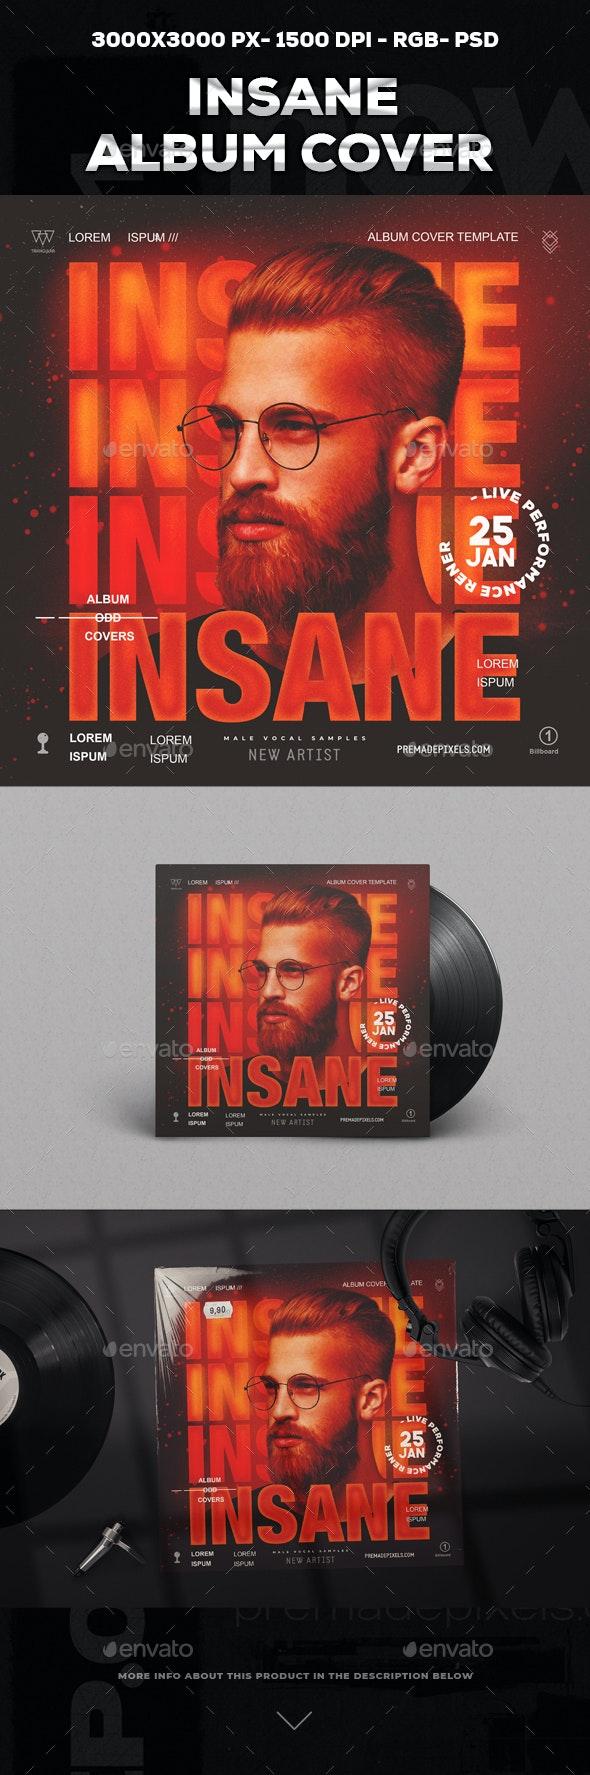 Insane Album Cover Template - Miscellaneous Social Media